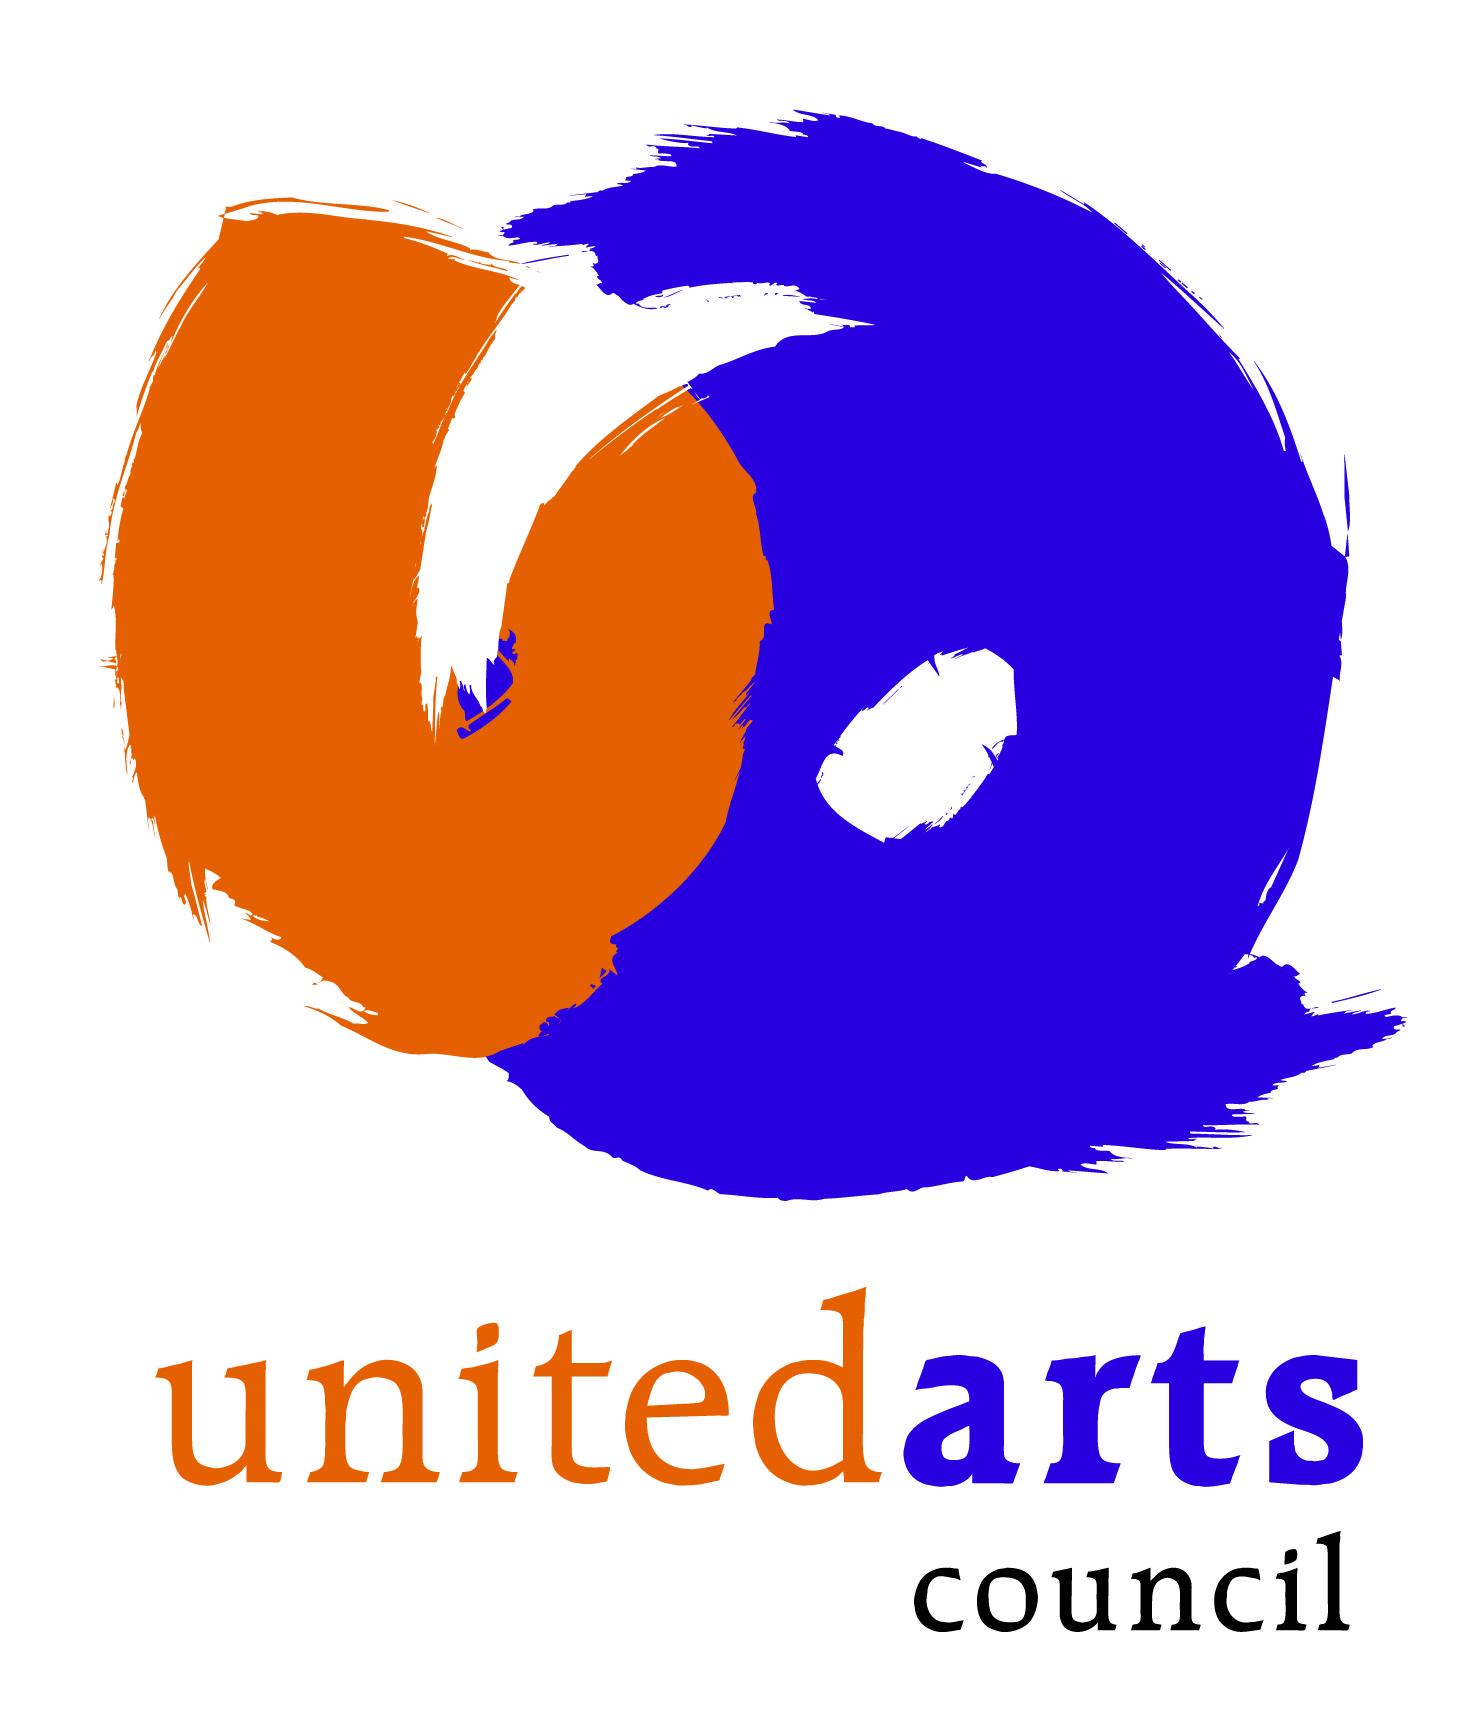 United Arts Council logo